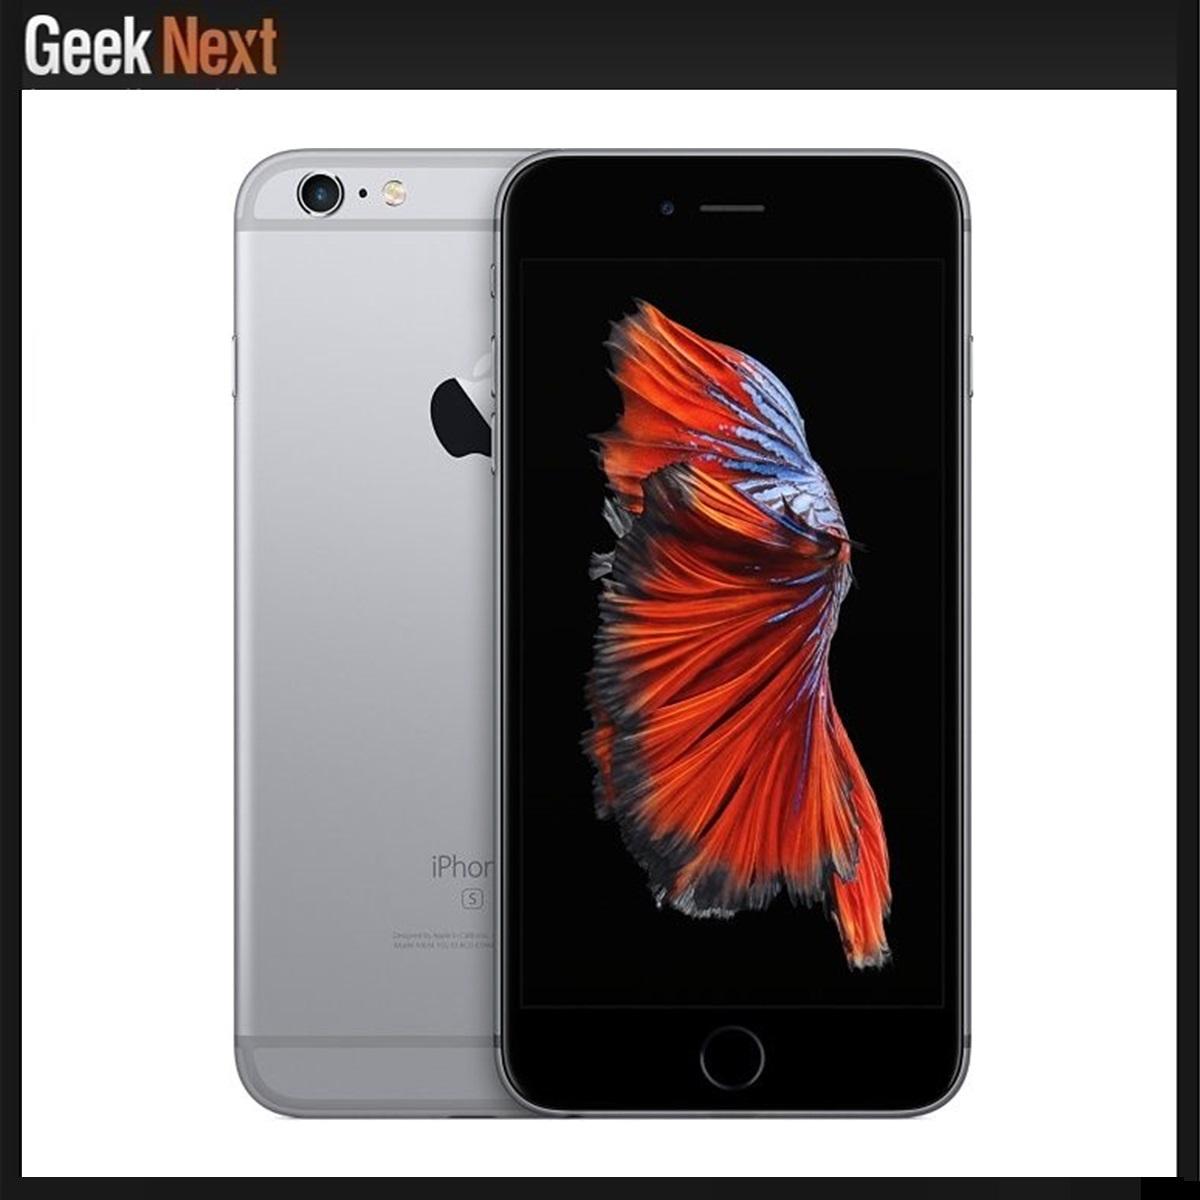 apple iphone 6 6 plus l 6s 6s plus at t t mobile verizon unlocked gsm unlocked ebay. Black Bedroom Furniture Sets. Home Design Ideas